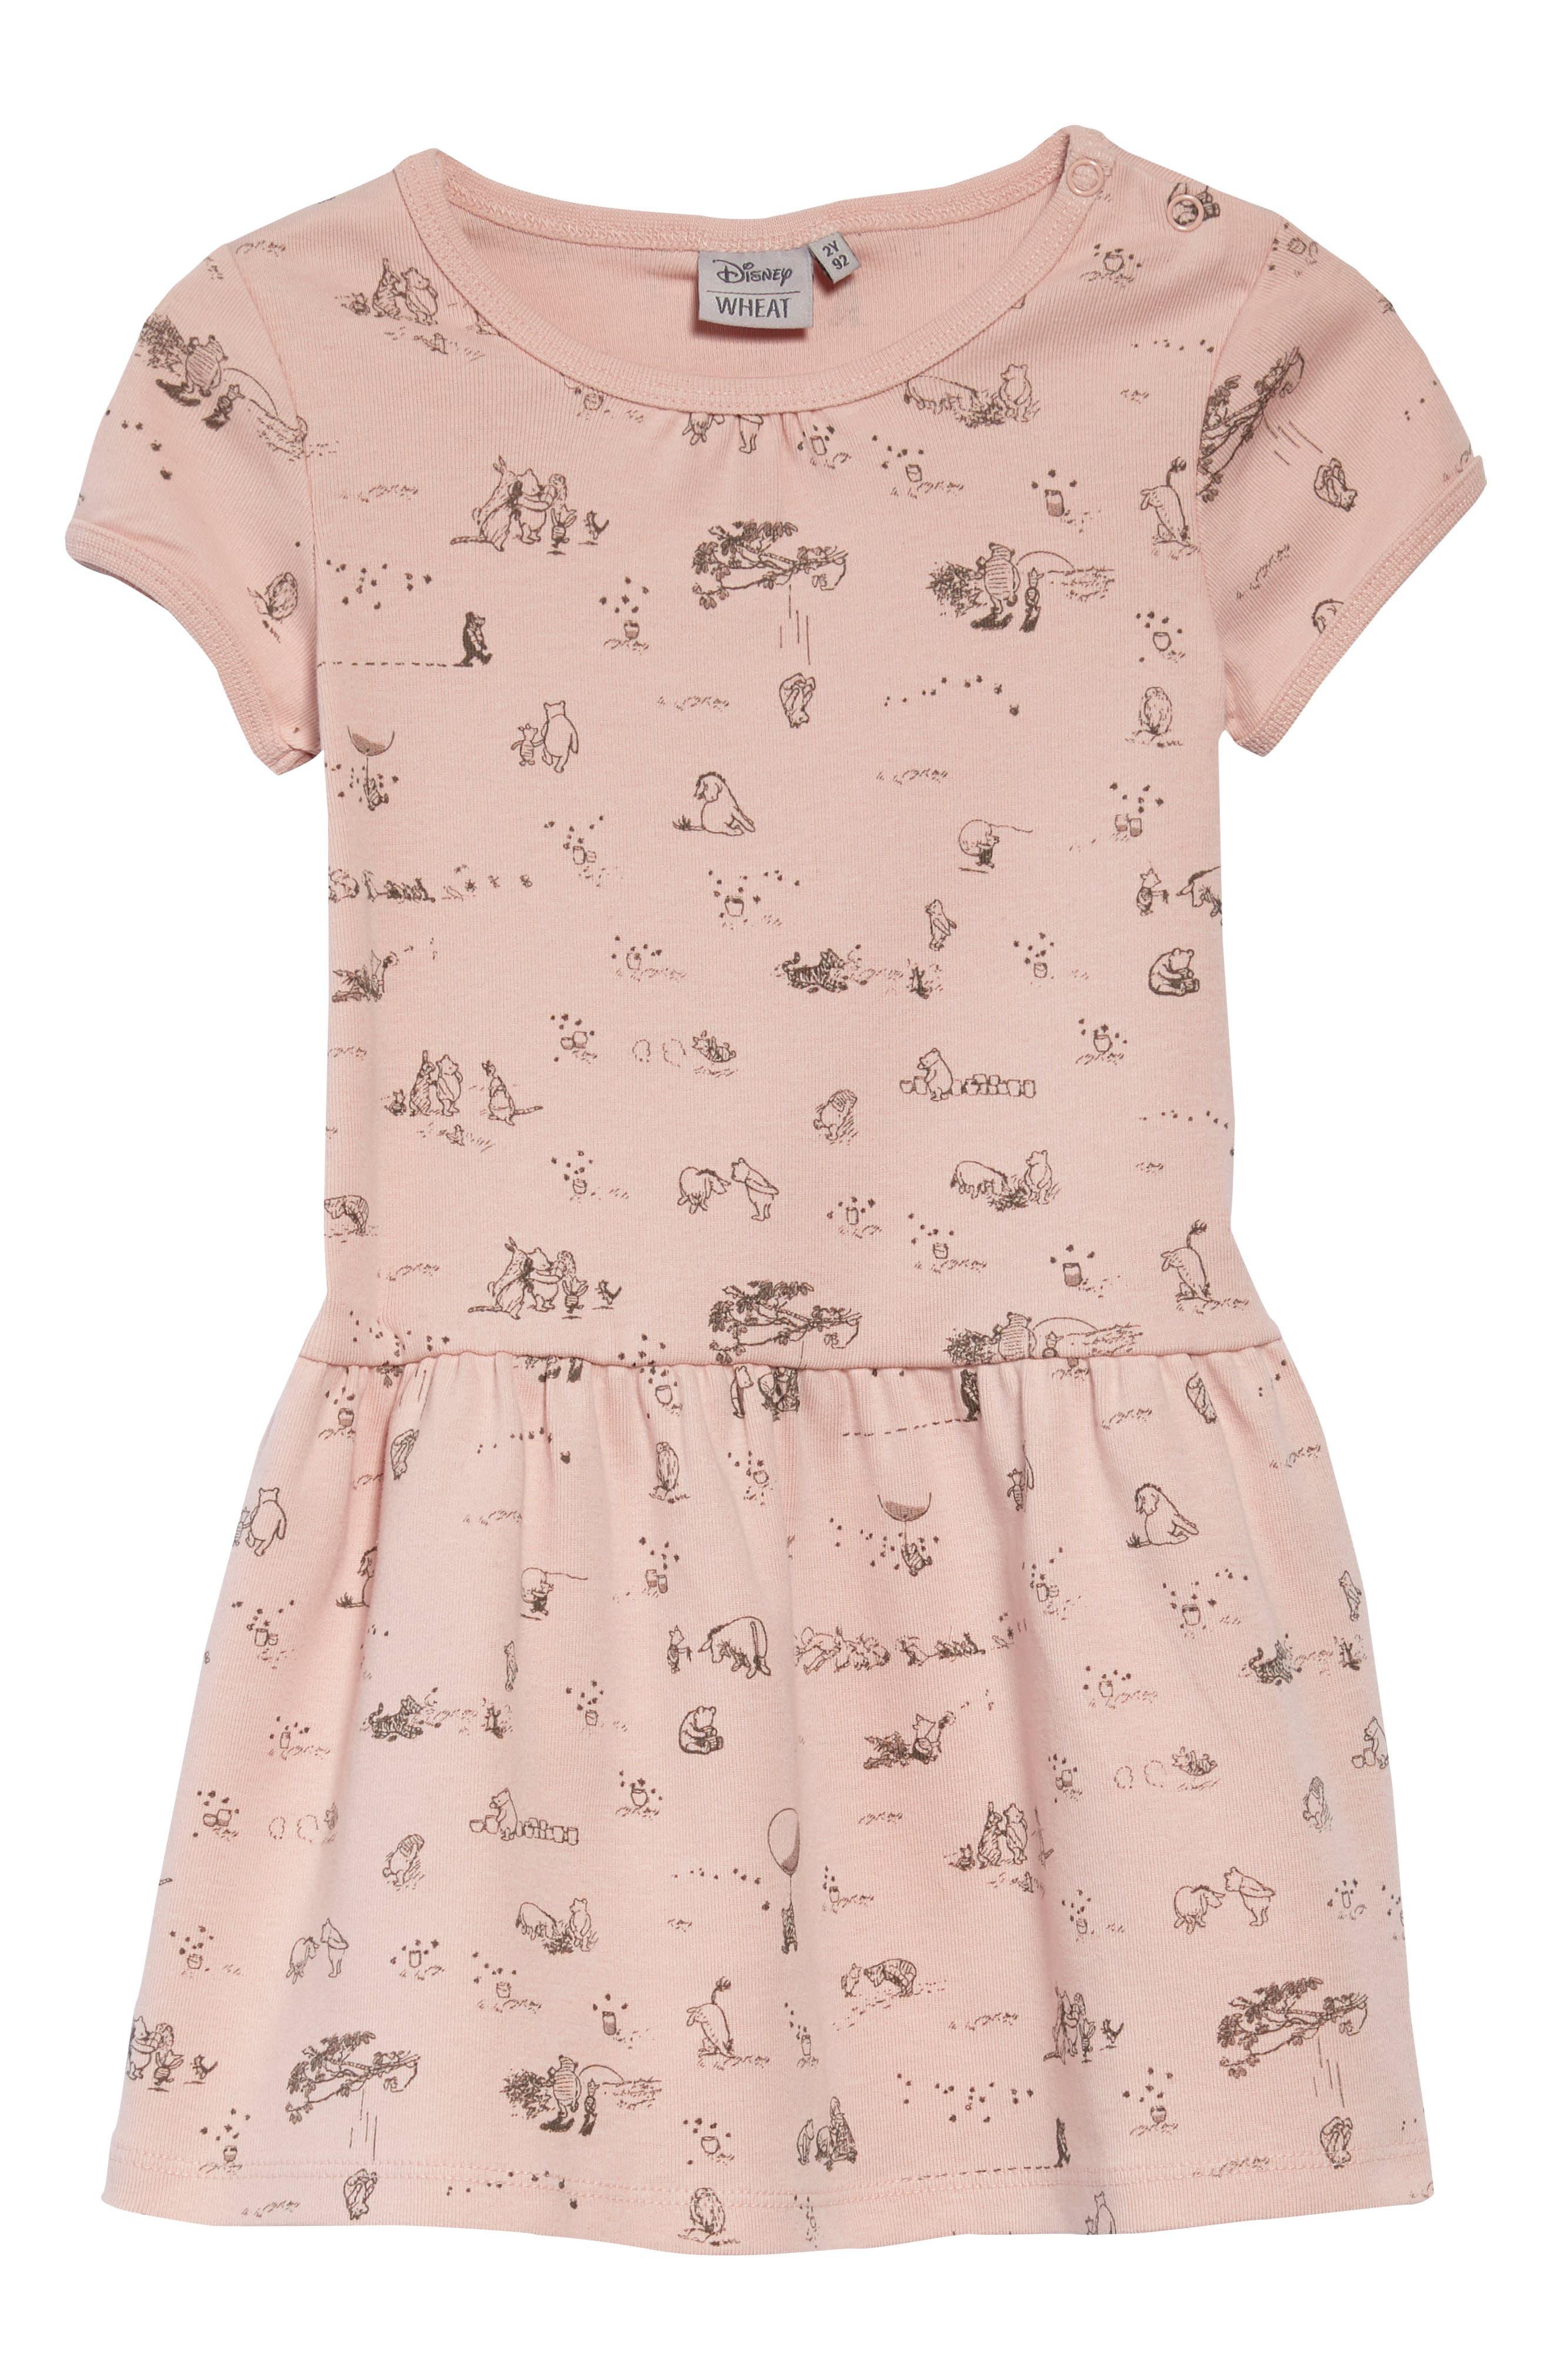 x Disney<sup>®</sup> Winnie the Pooh Print Dress,                         Main,                         color, Powder